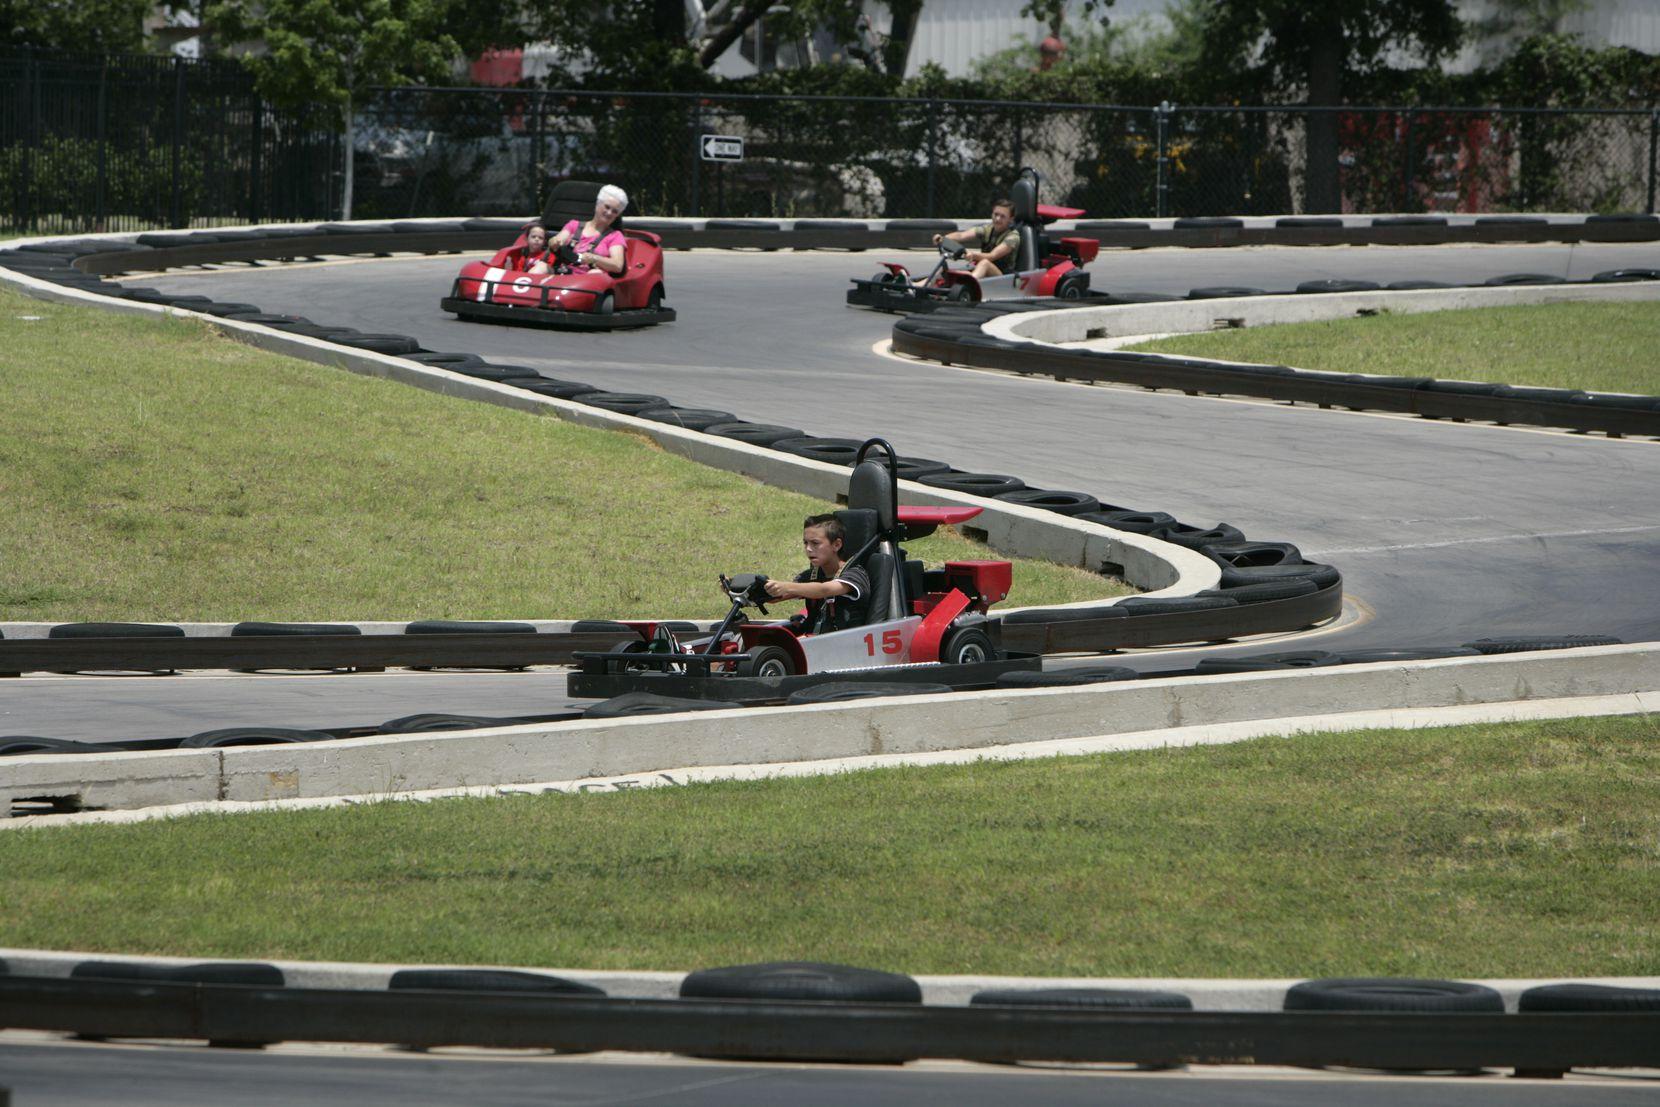 The SpeedZone racetrack was on Stemmons Freeway.